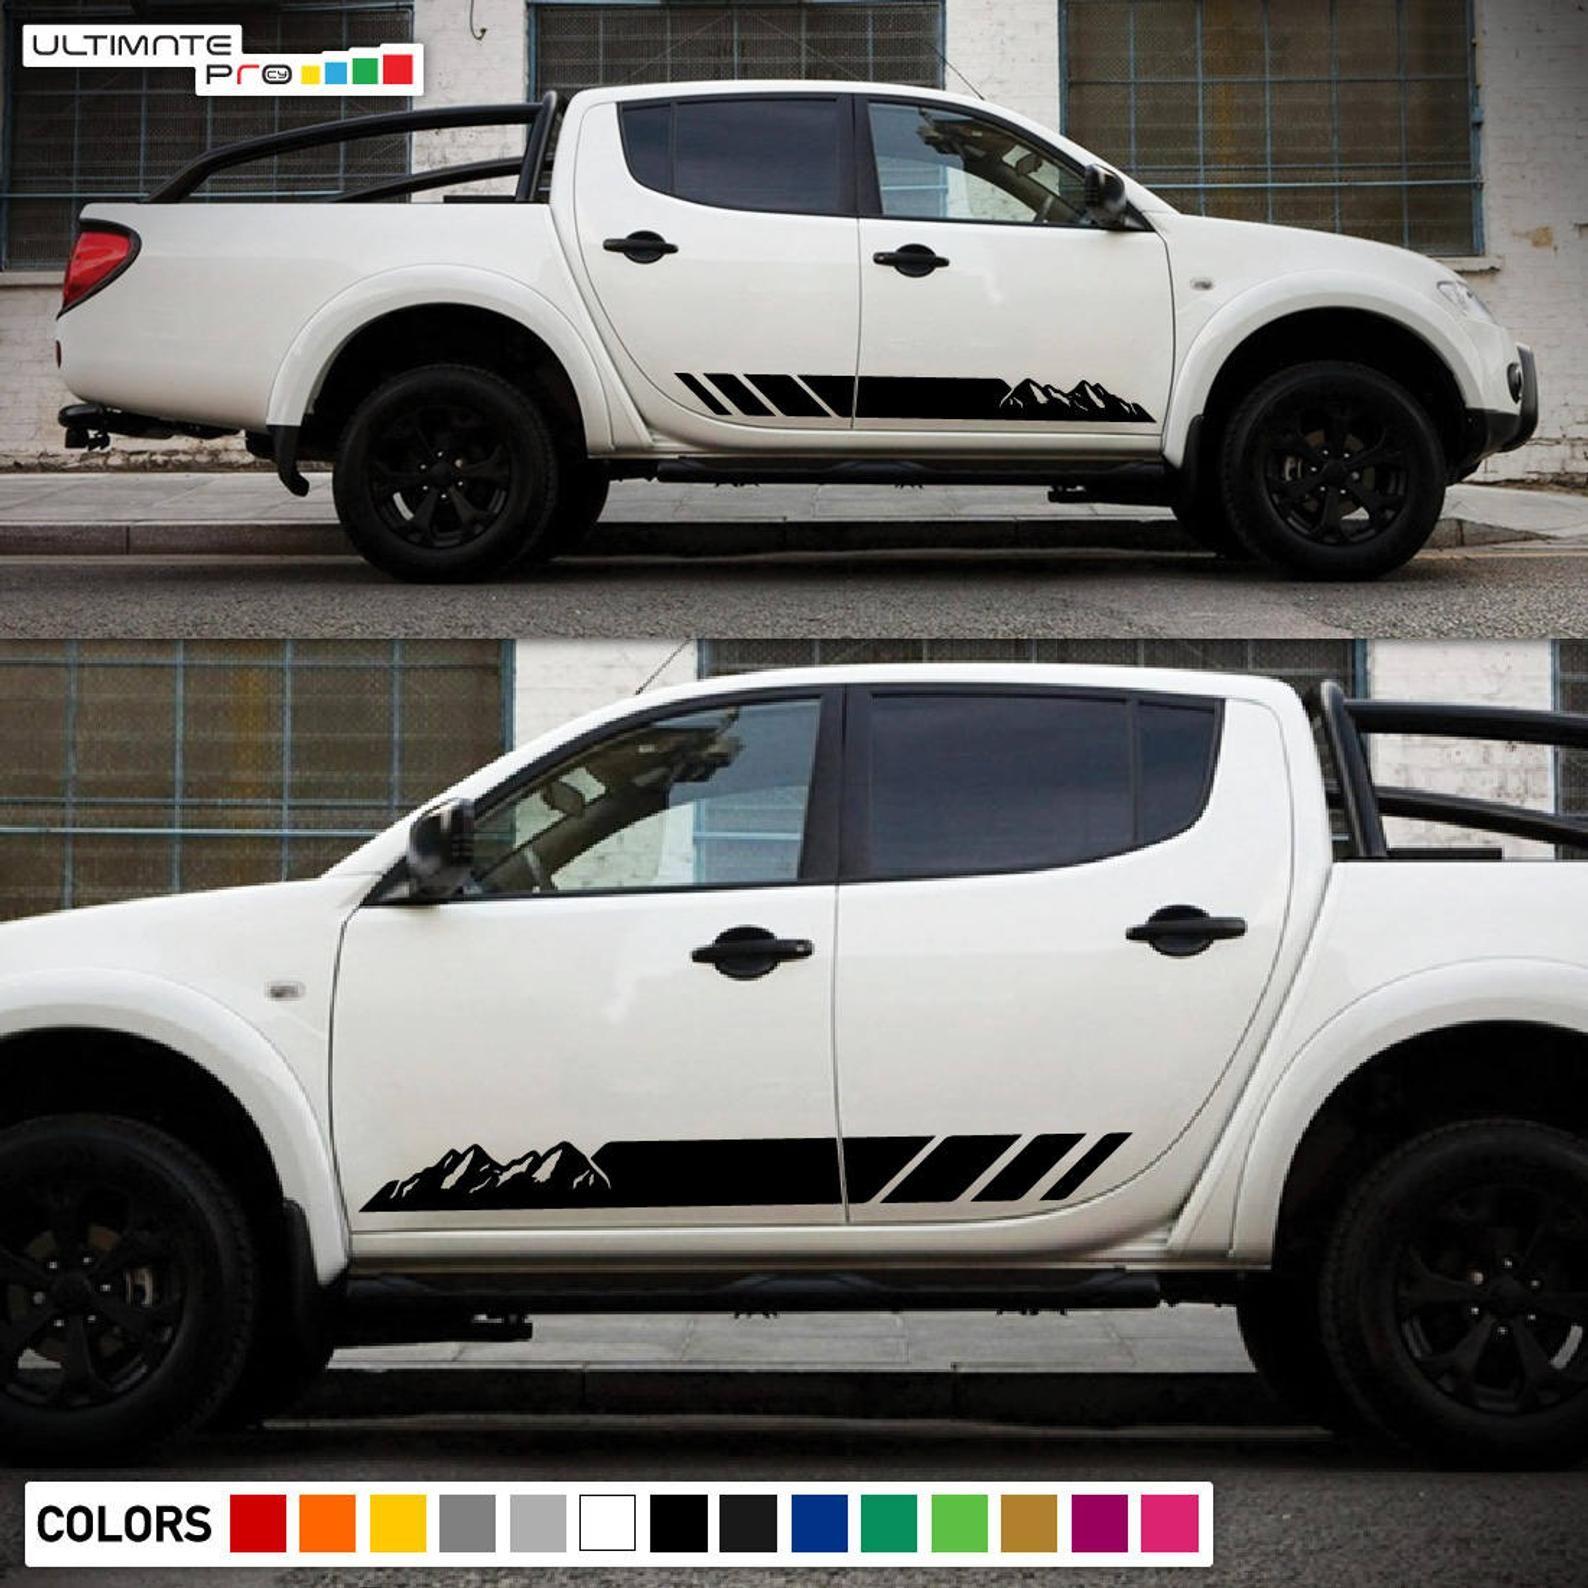 2x Decal Sticker Side Stripes Compatible With Mitsubishi L200 Etsy In 2020 Car Stripe Kit Mitsubishi